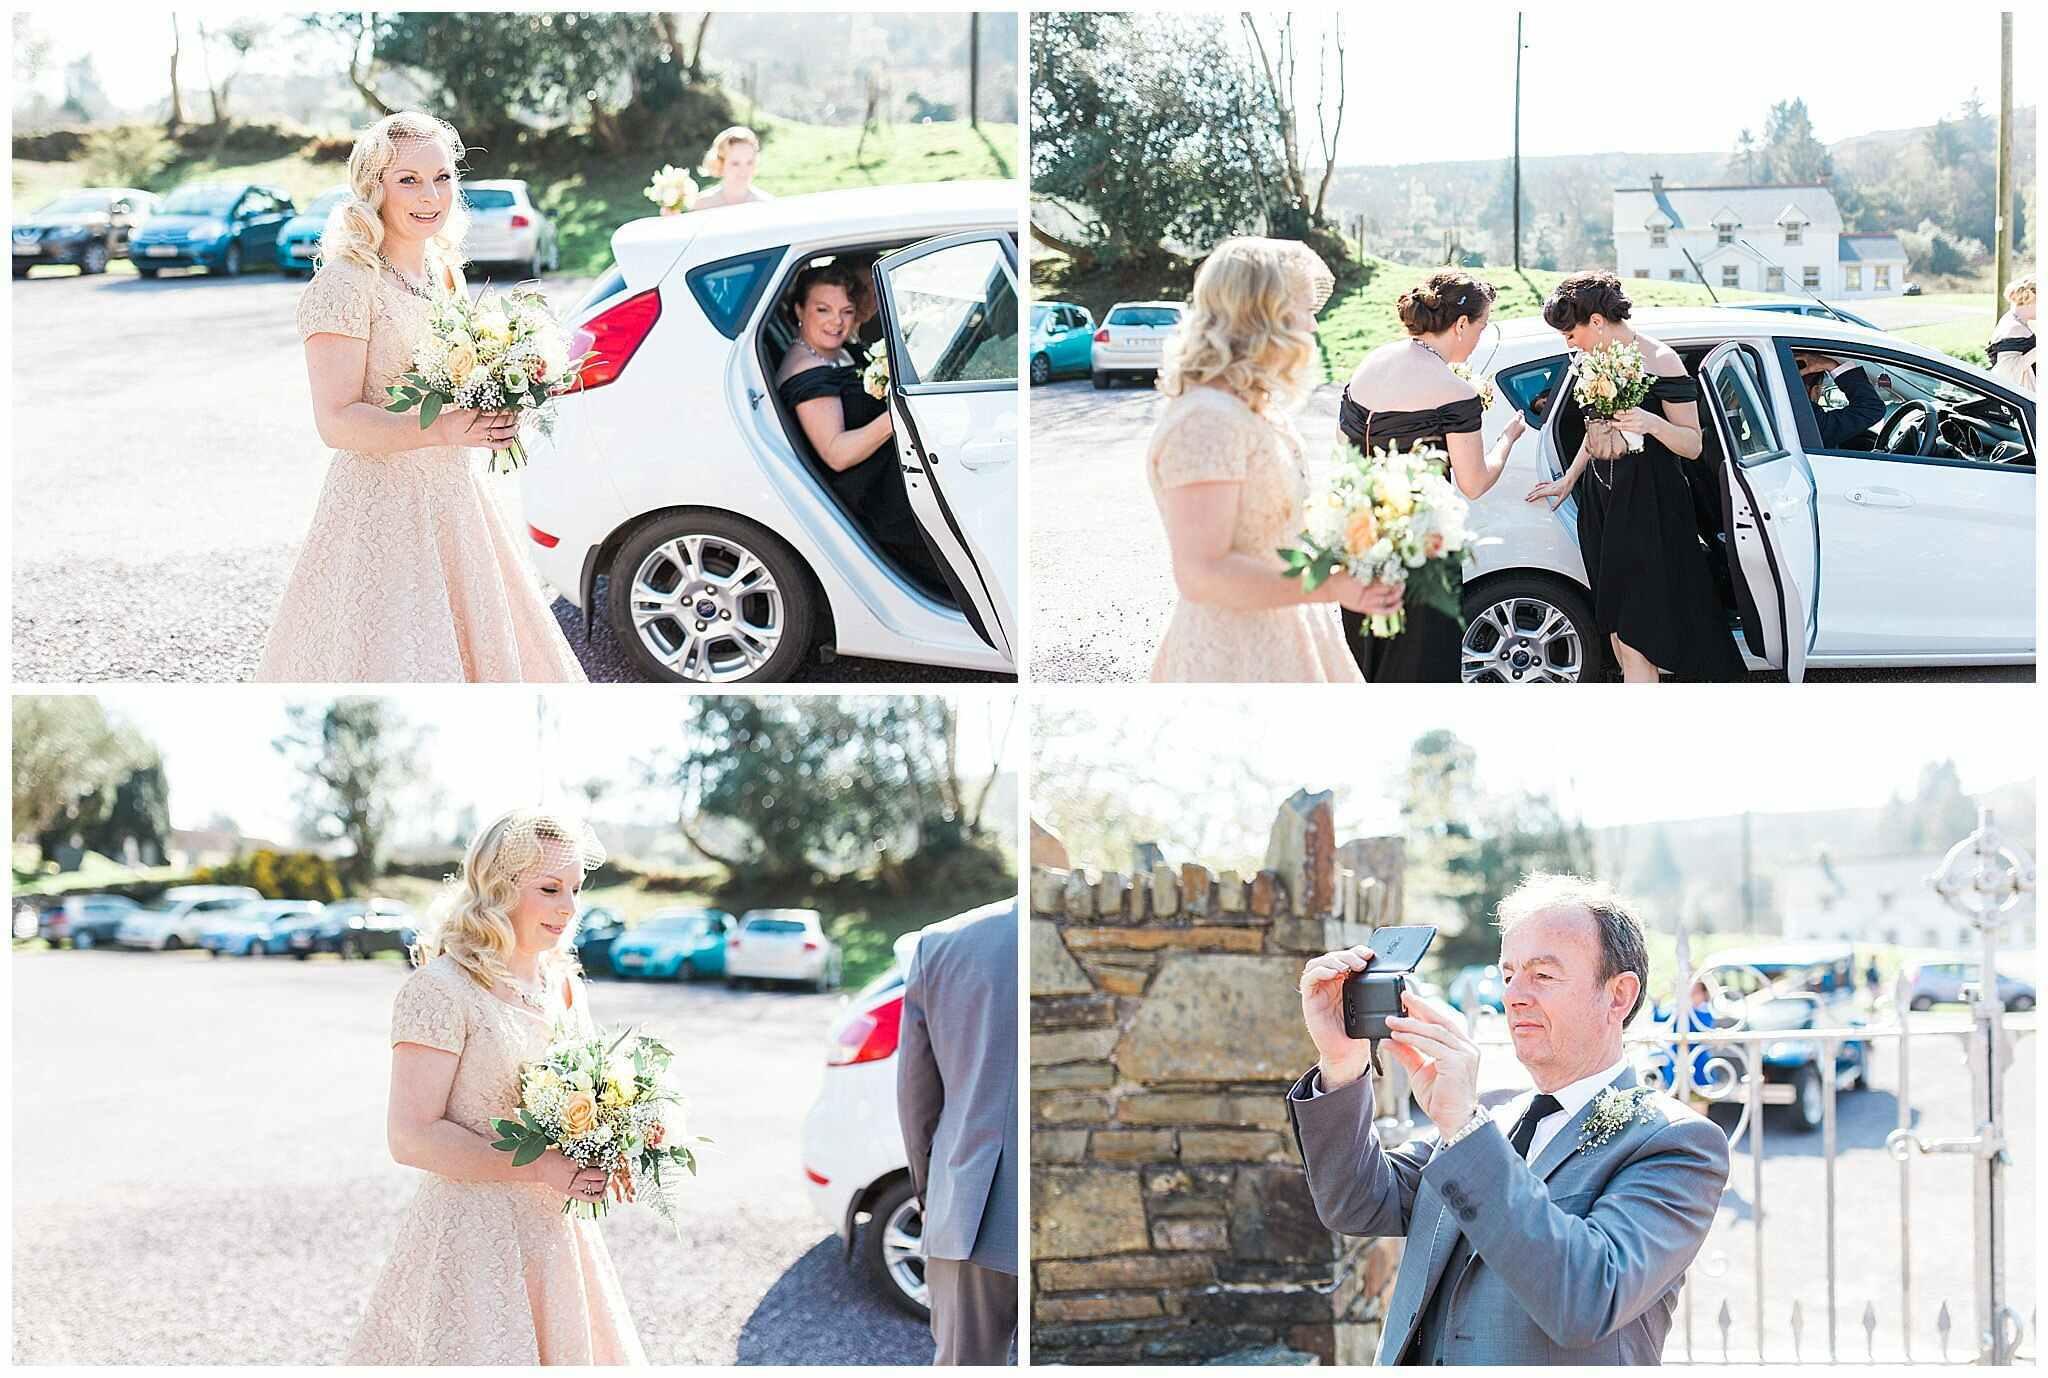 Deirdre + James wedding in Gougane Barra 10